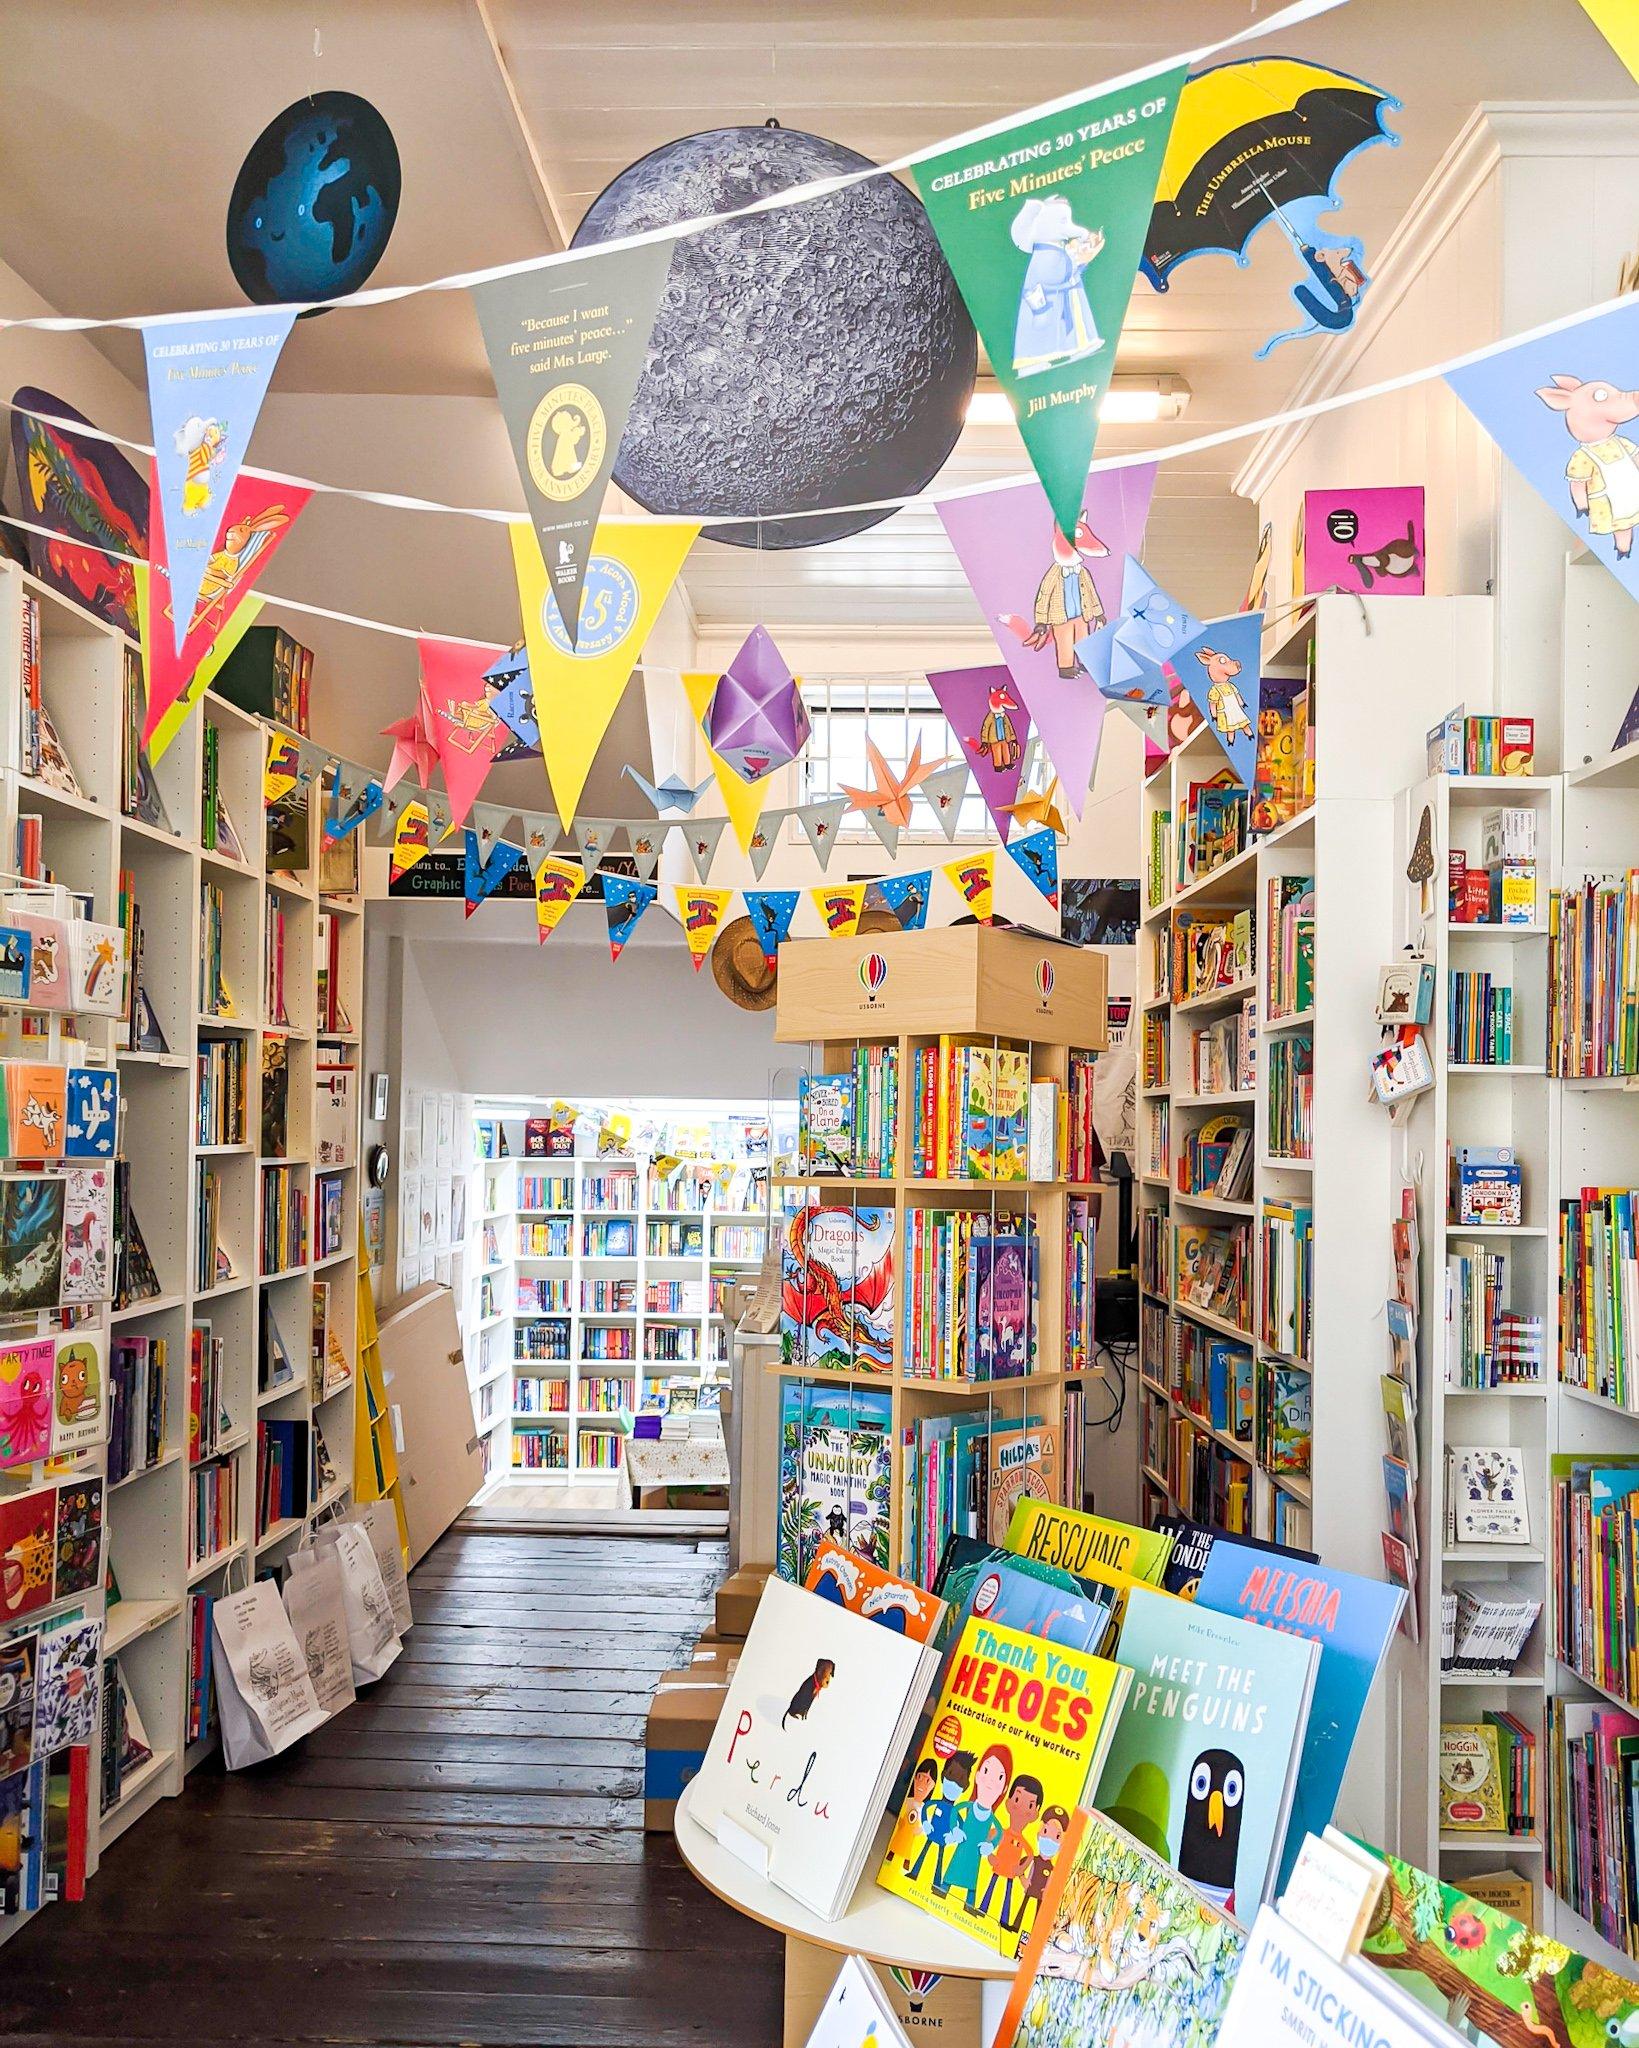 The Alligator's Mouth, Richmond, Surrey - one of many brilliant children's bookshops in Britain